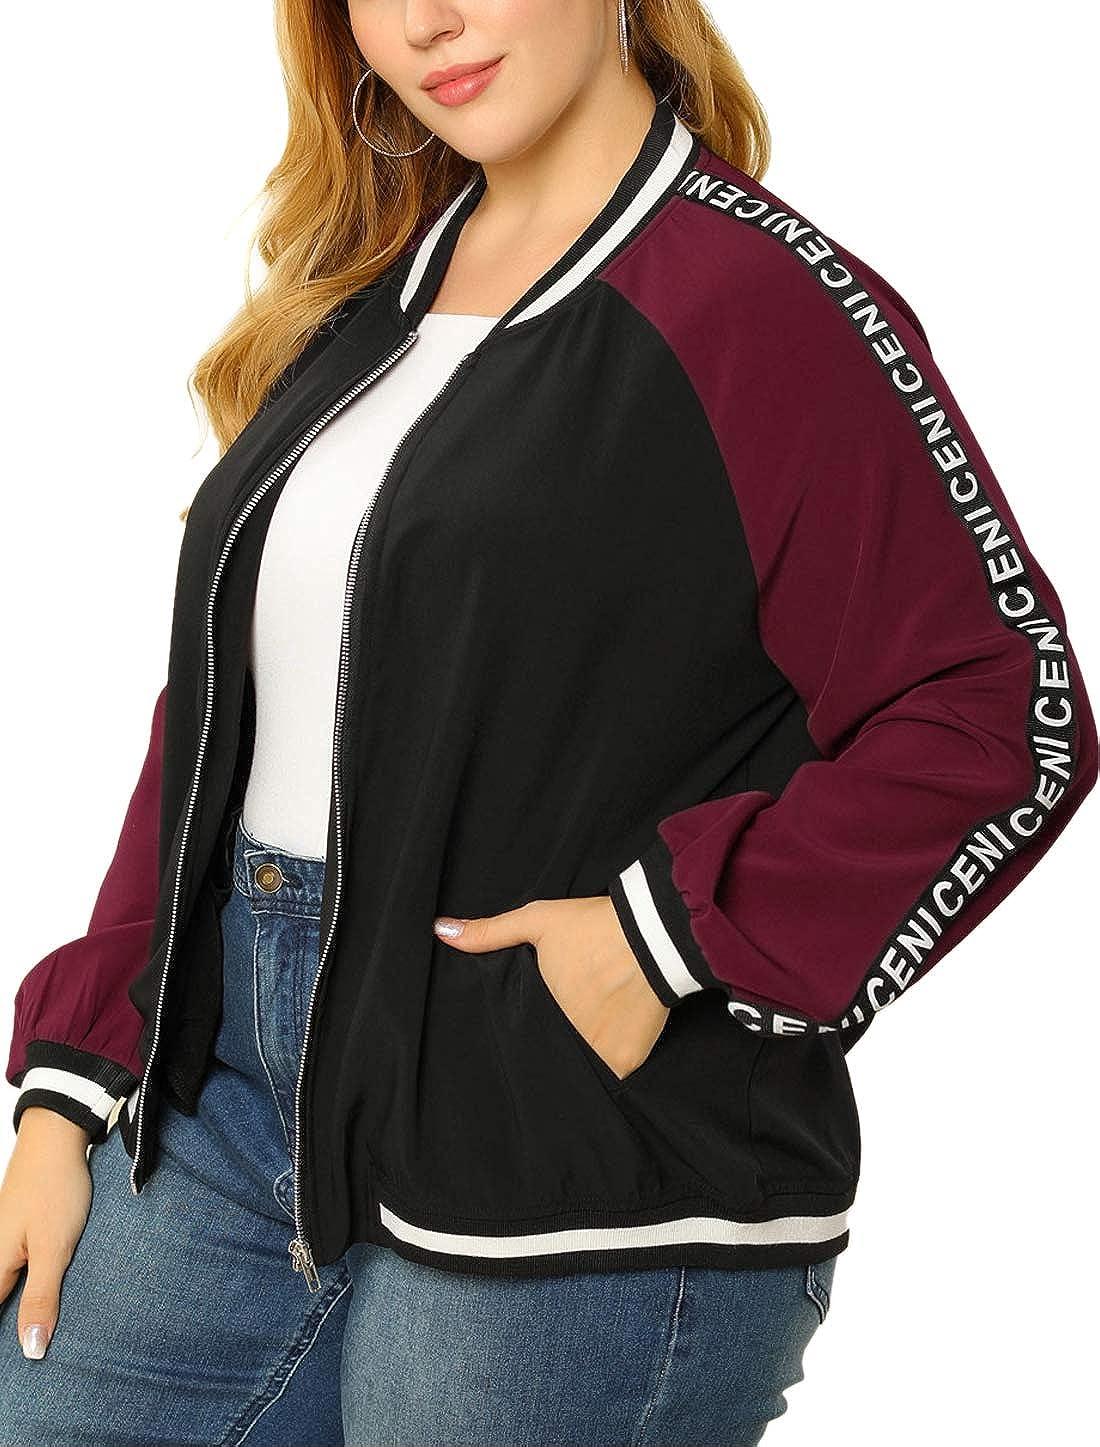 Agnes Orinda Women's Plus Size Lightweight Jackets Color Block Long Sleeve Zip Bomber Jacket Mothers Day